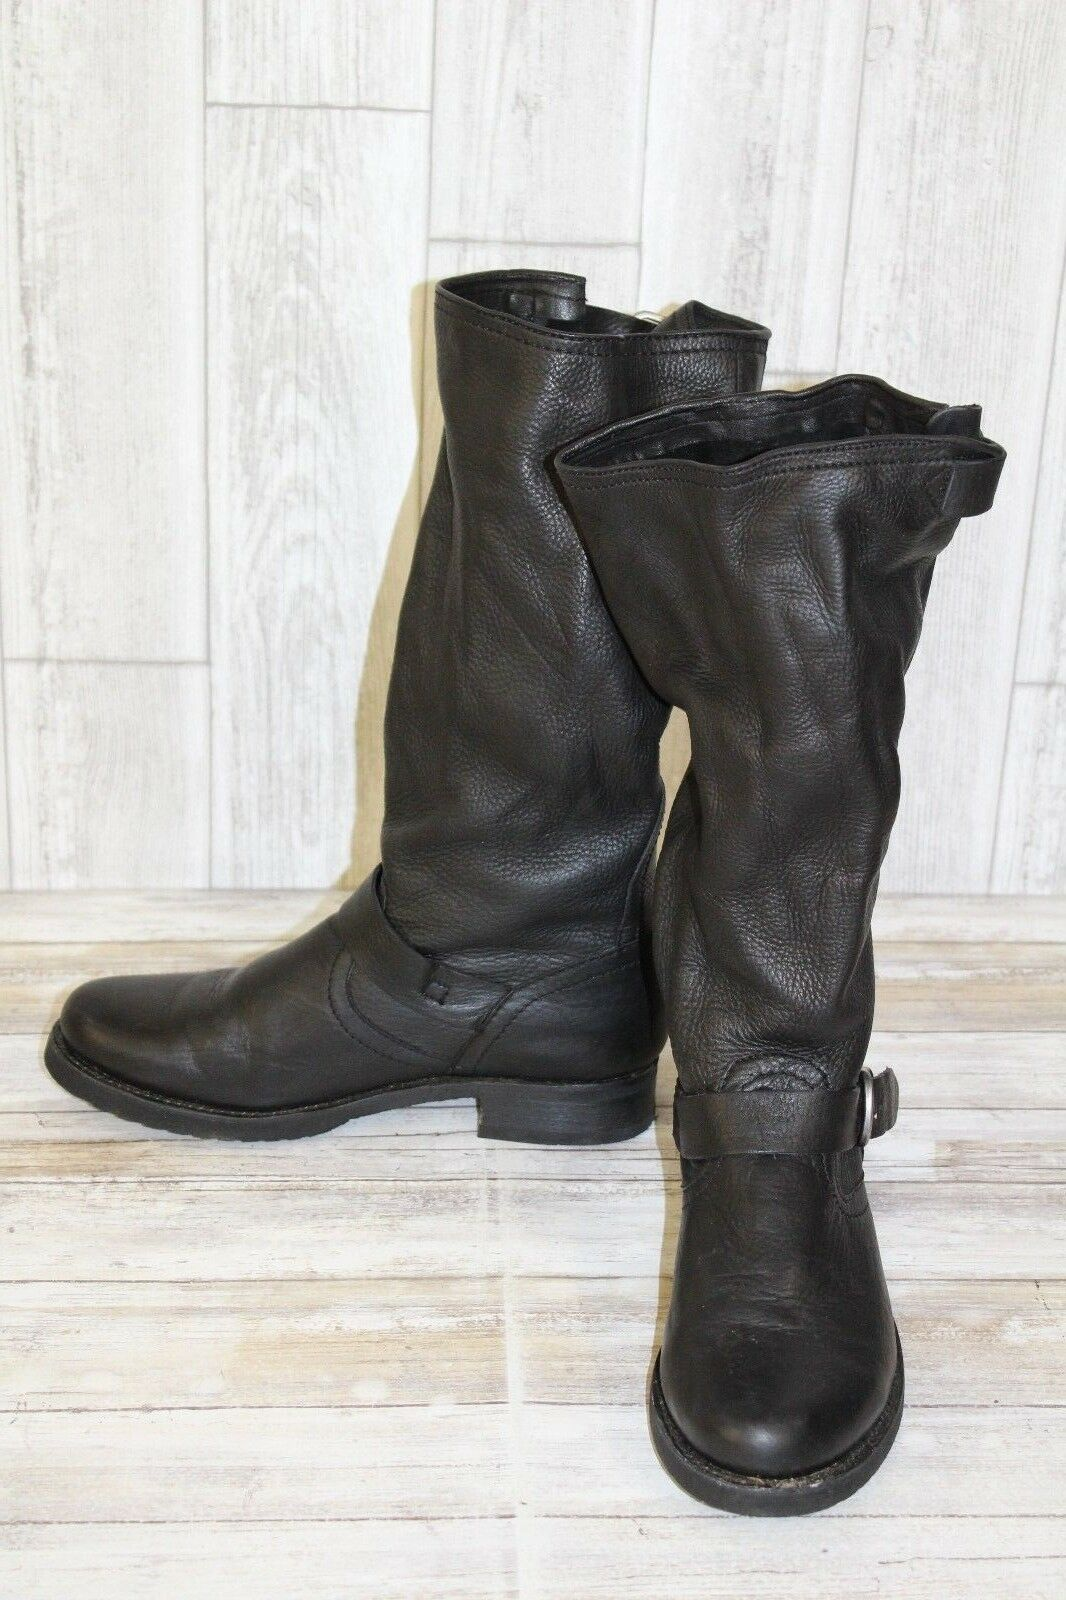 Frye Veronica Slouch 2 Boots - Women's Size 9.5 B - Black